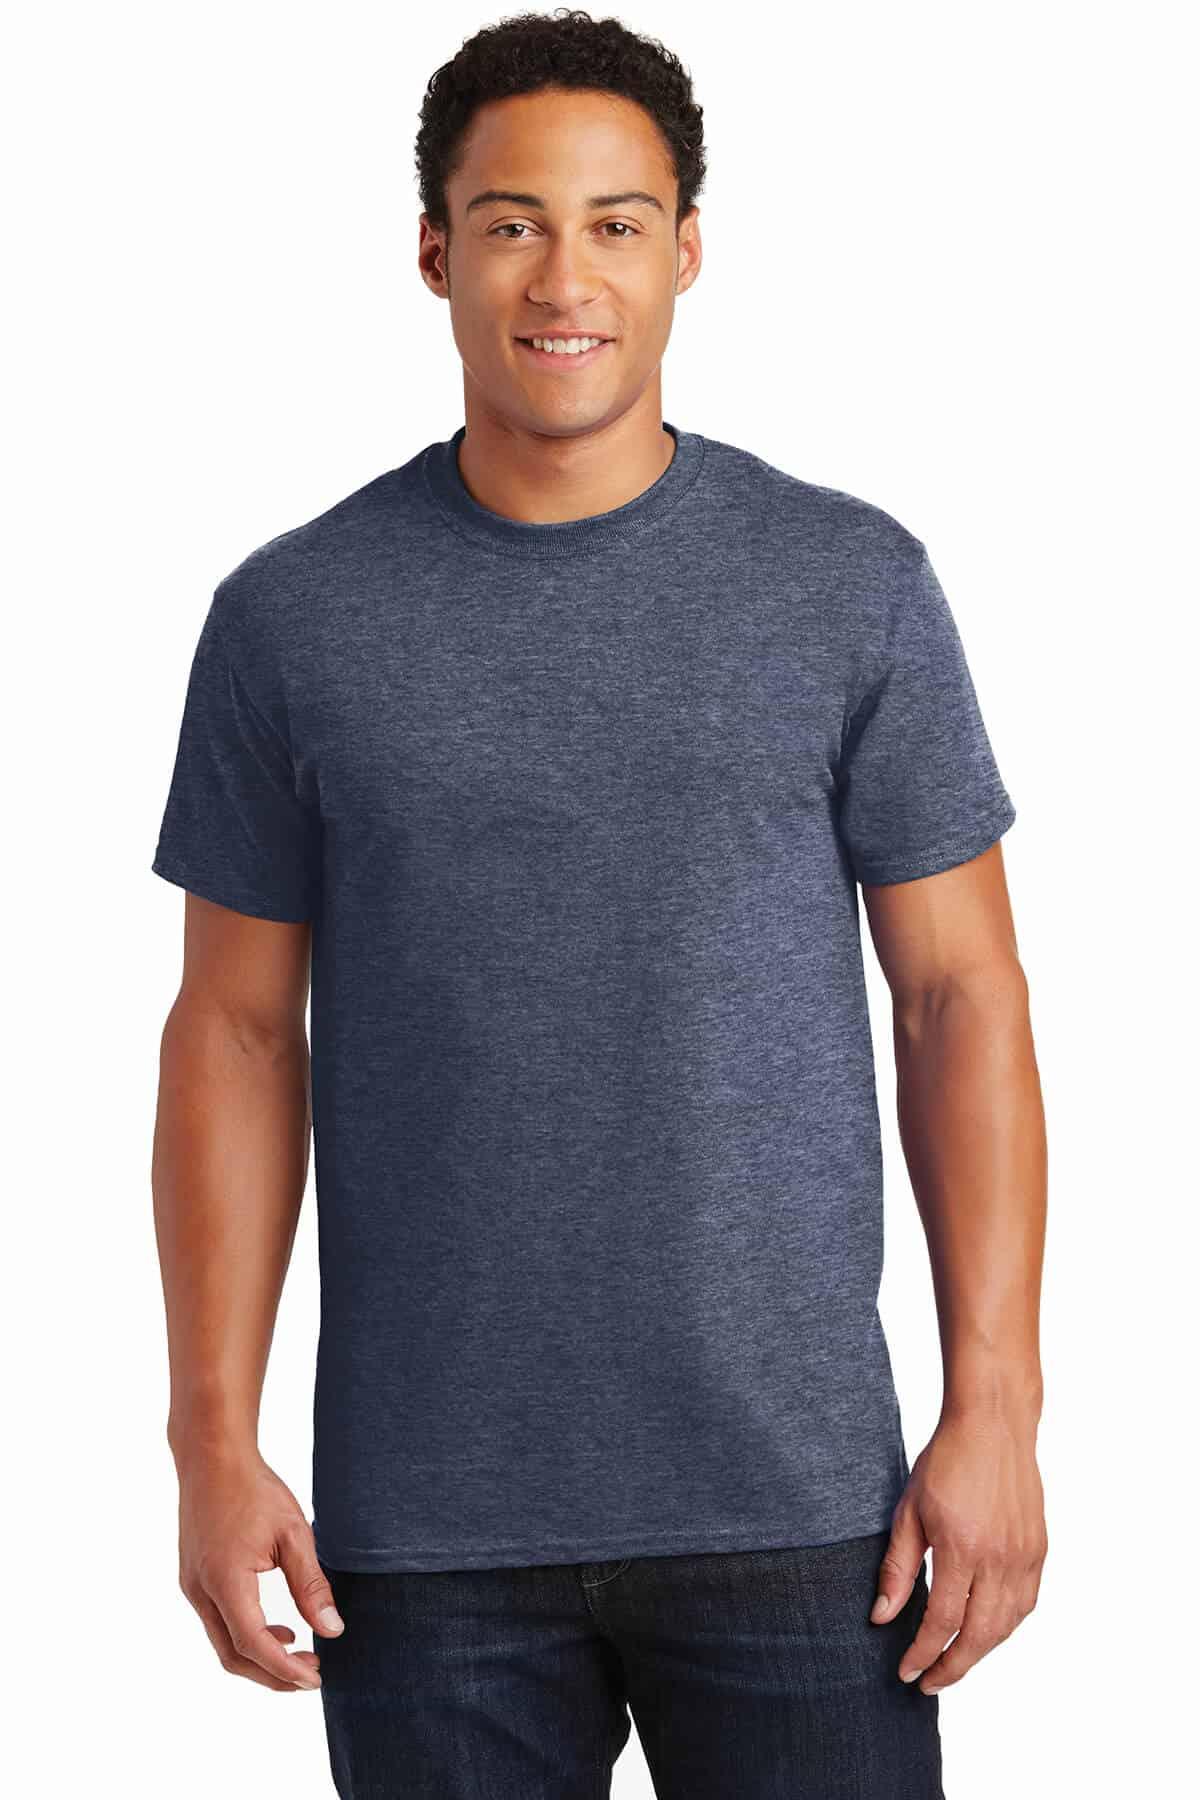 Heathered Navy TeeShirt Front